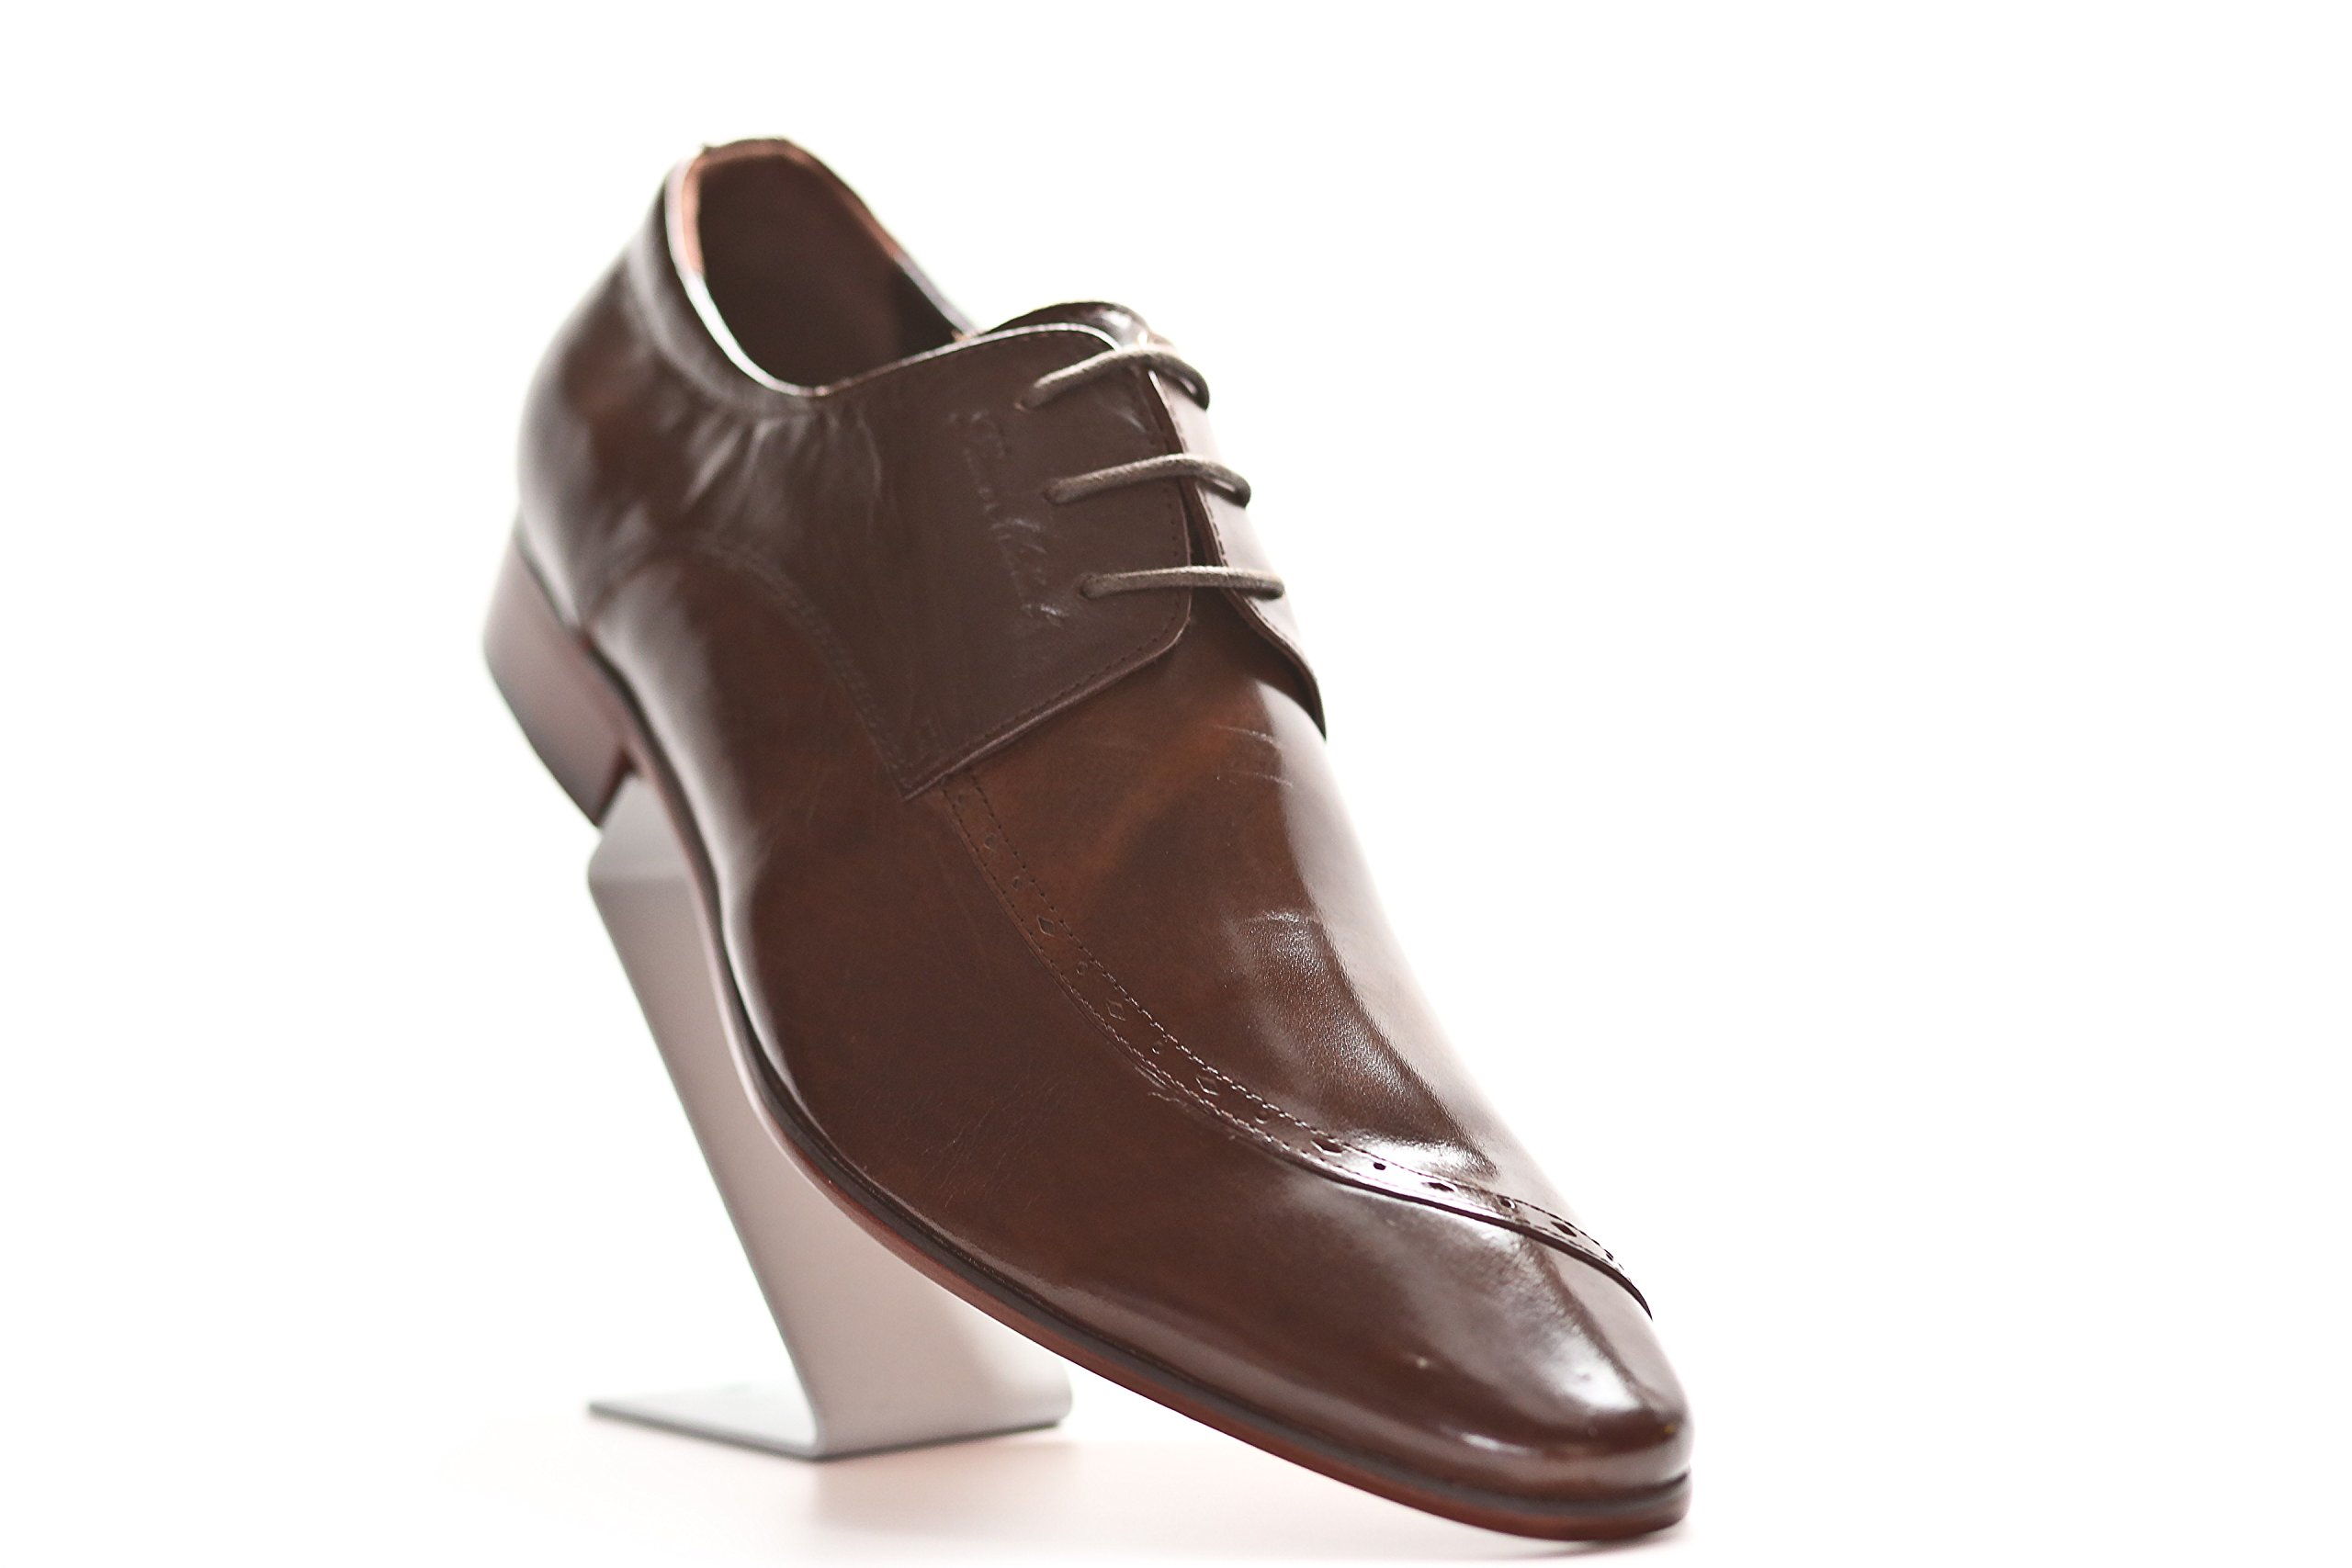 Liam Michael Men's Leather Jupiter Shoe (12, Coffee) by Liam Michael Shoes